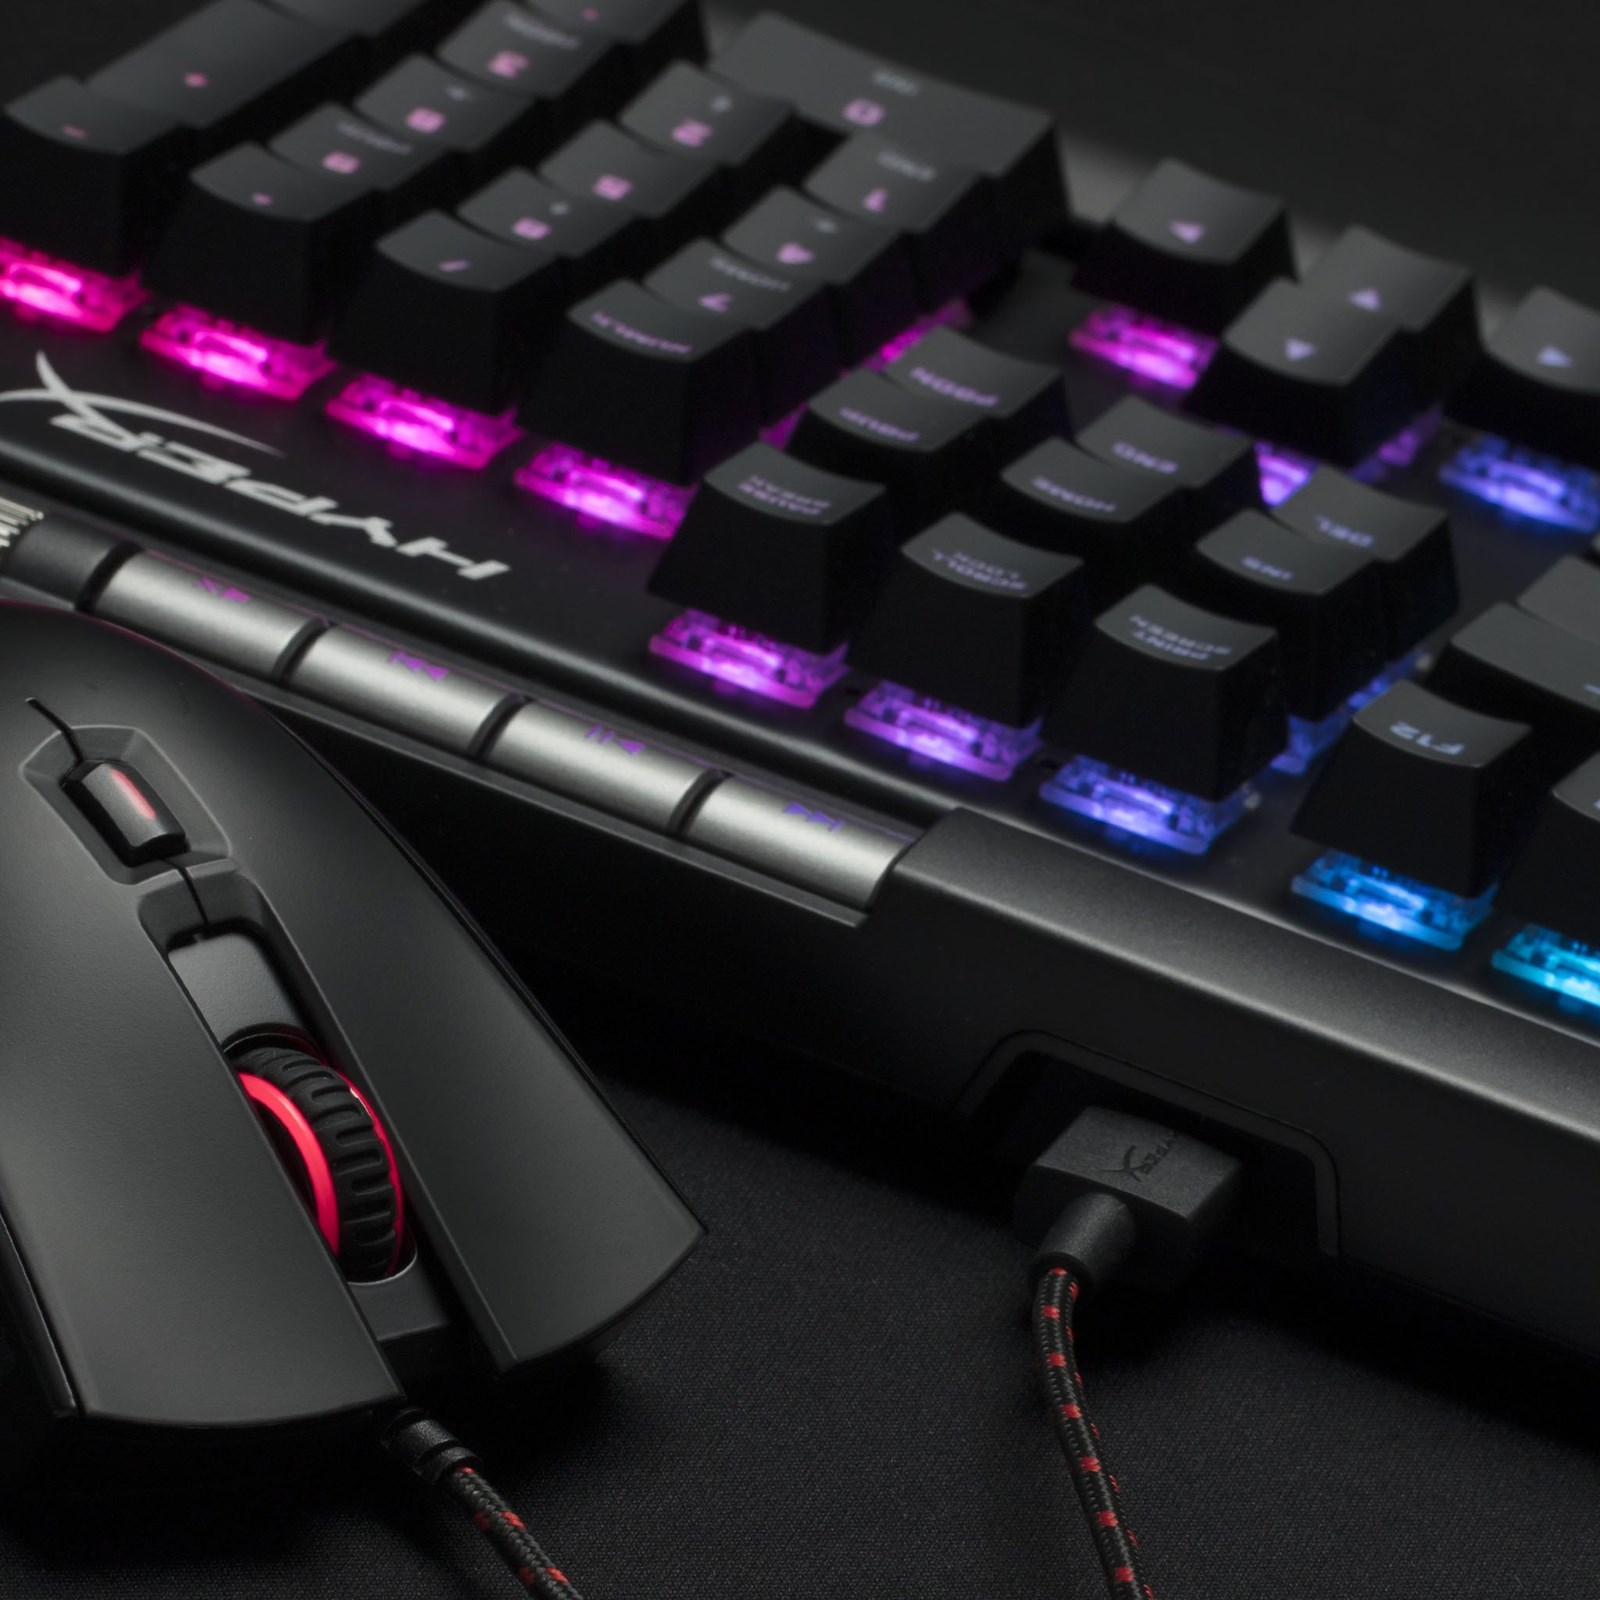 deb13241235 HyperX Alloy Elite RGB Mechanical Keyboard - HX-KB2RD2-UK/R1 | CCL ...